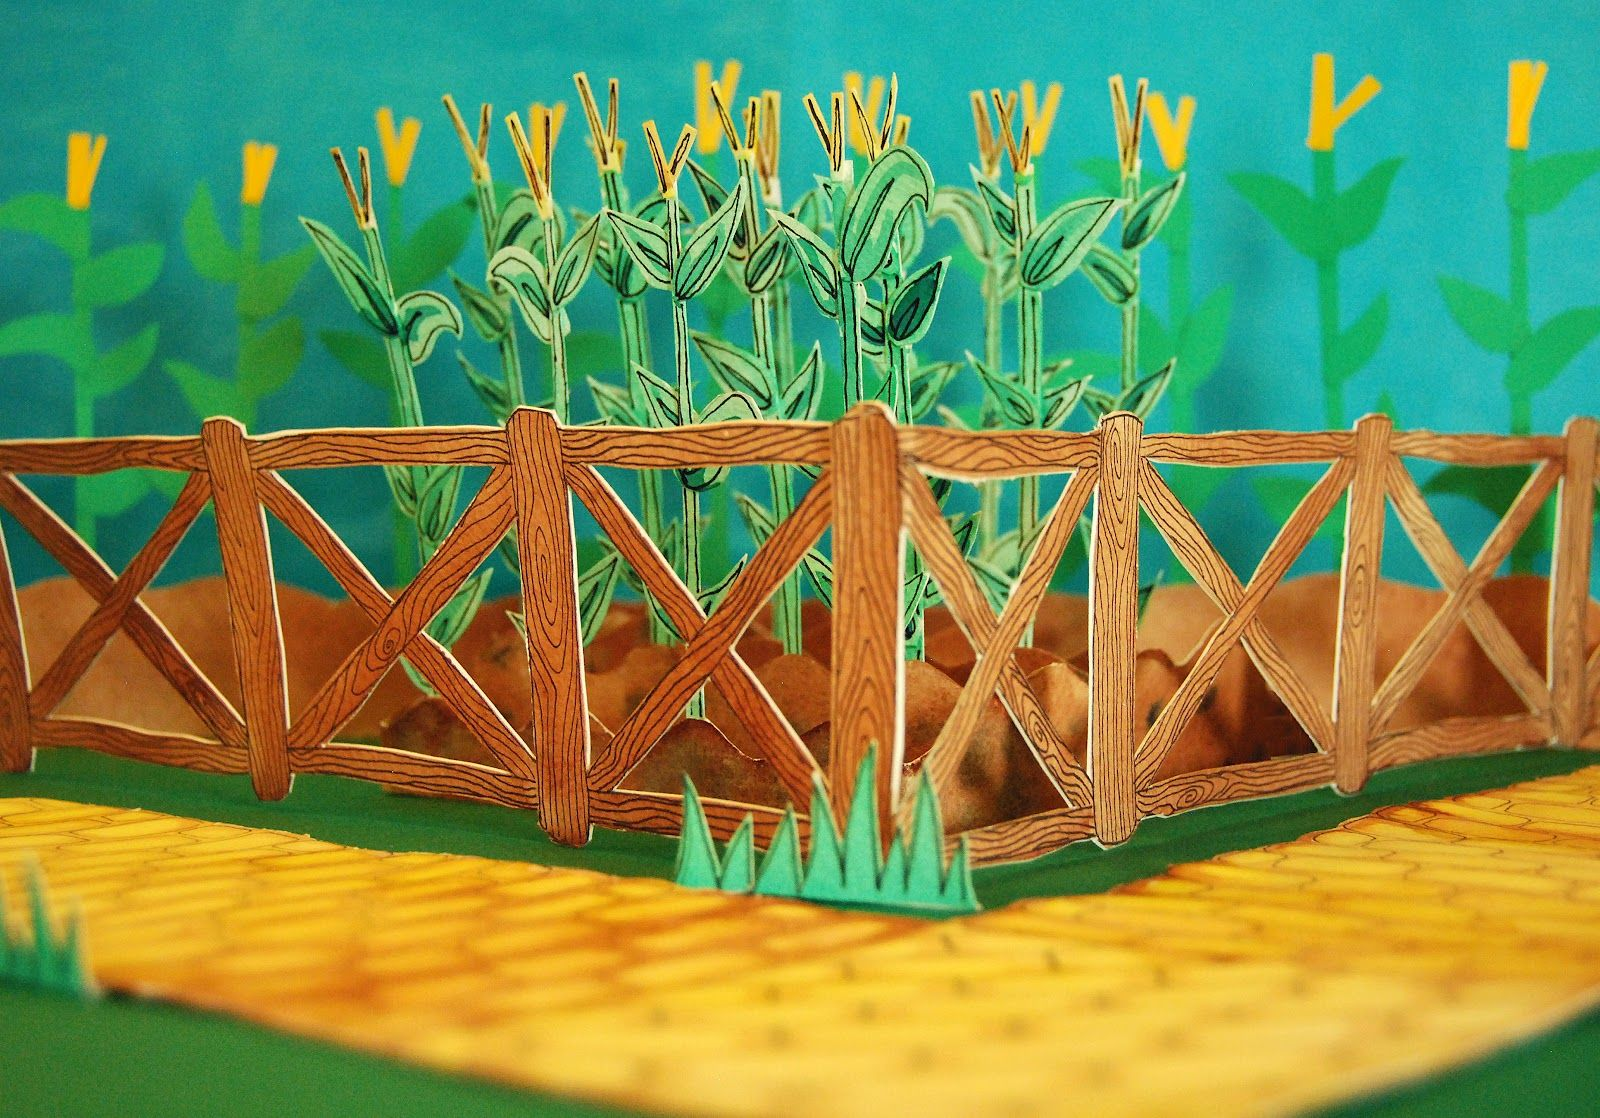 Wizrd Of Oz Corn Field Ideas | The Wizard Of Oz